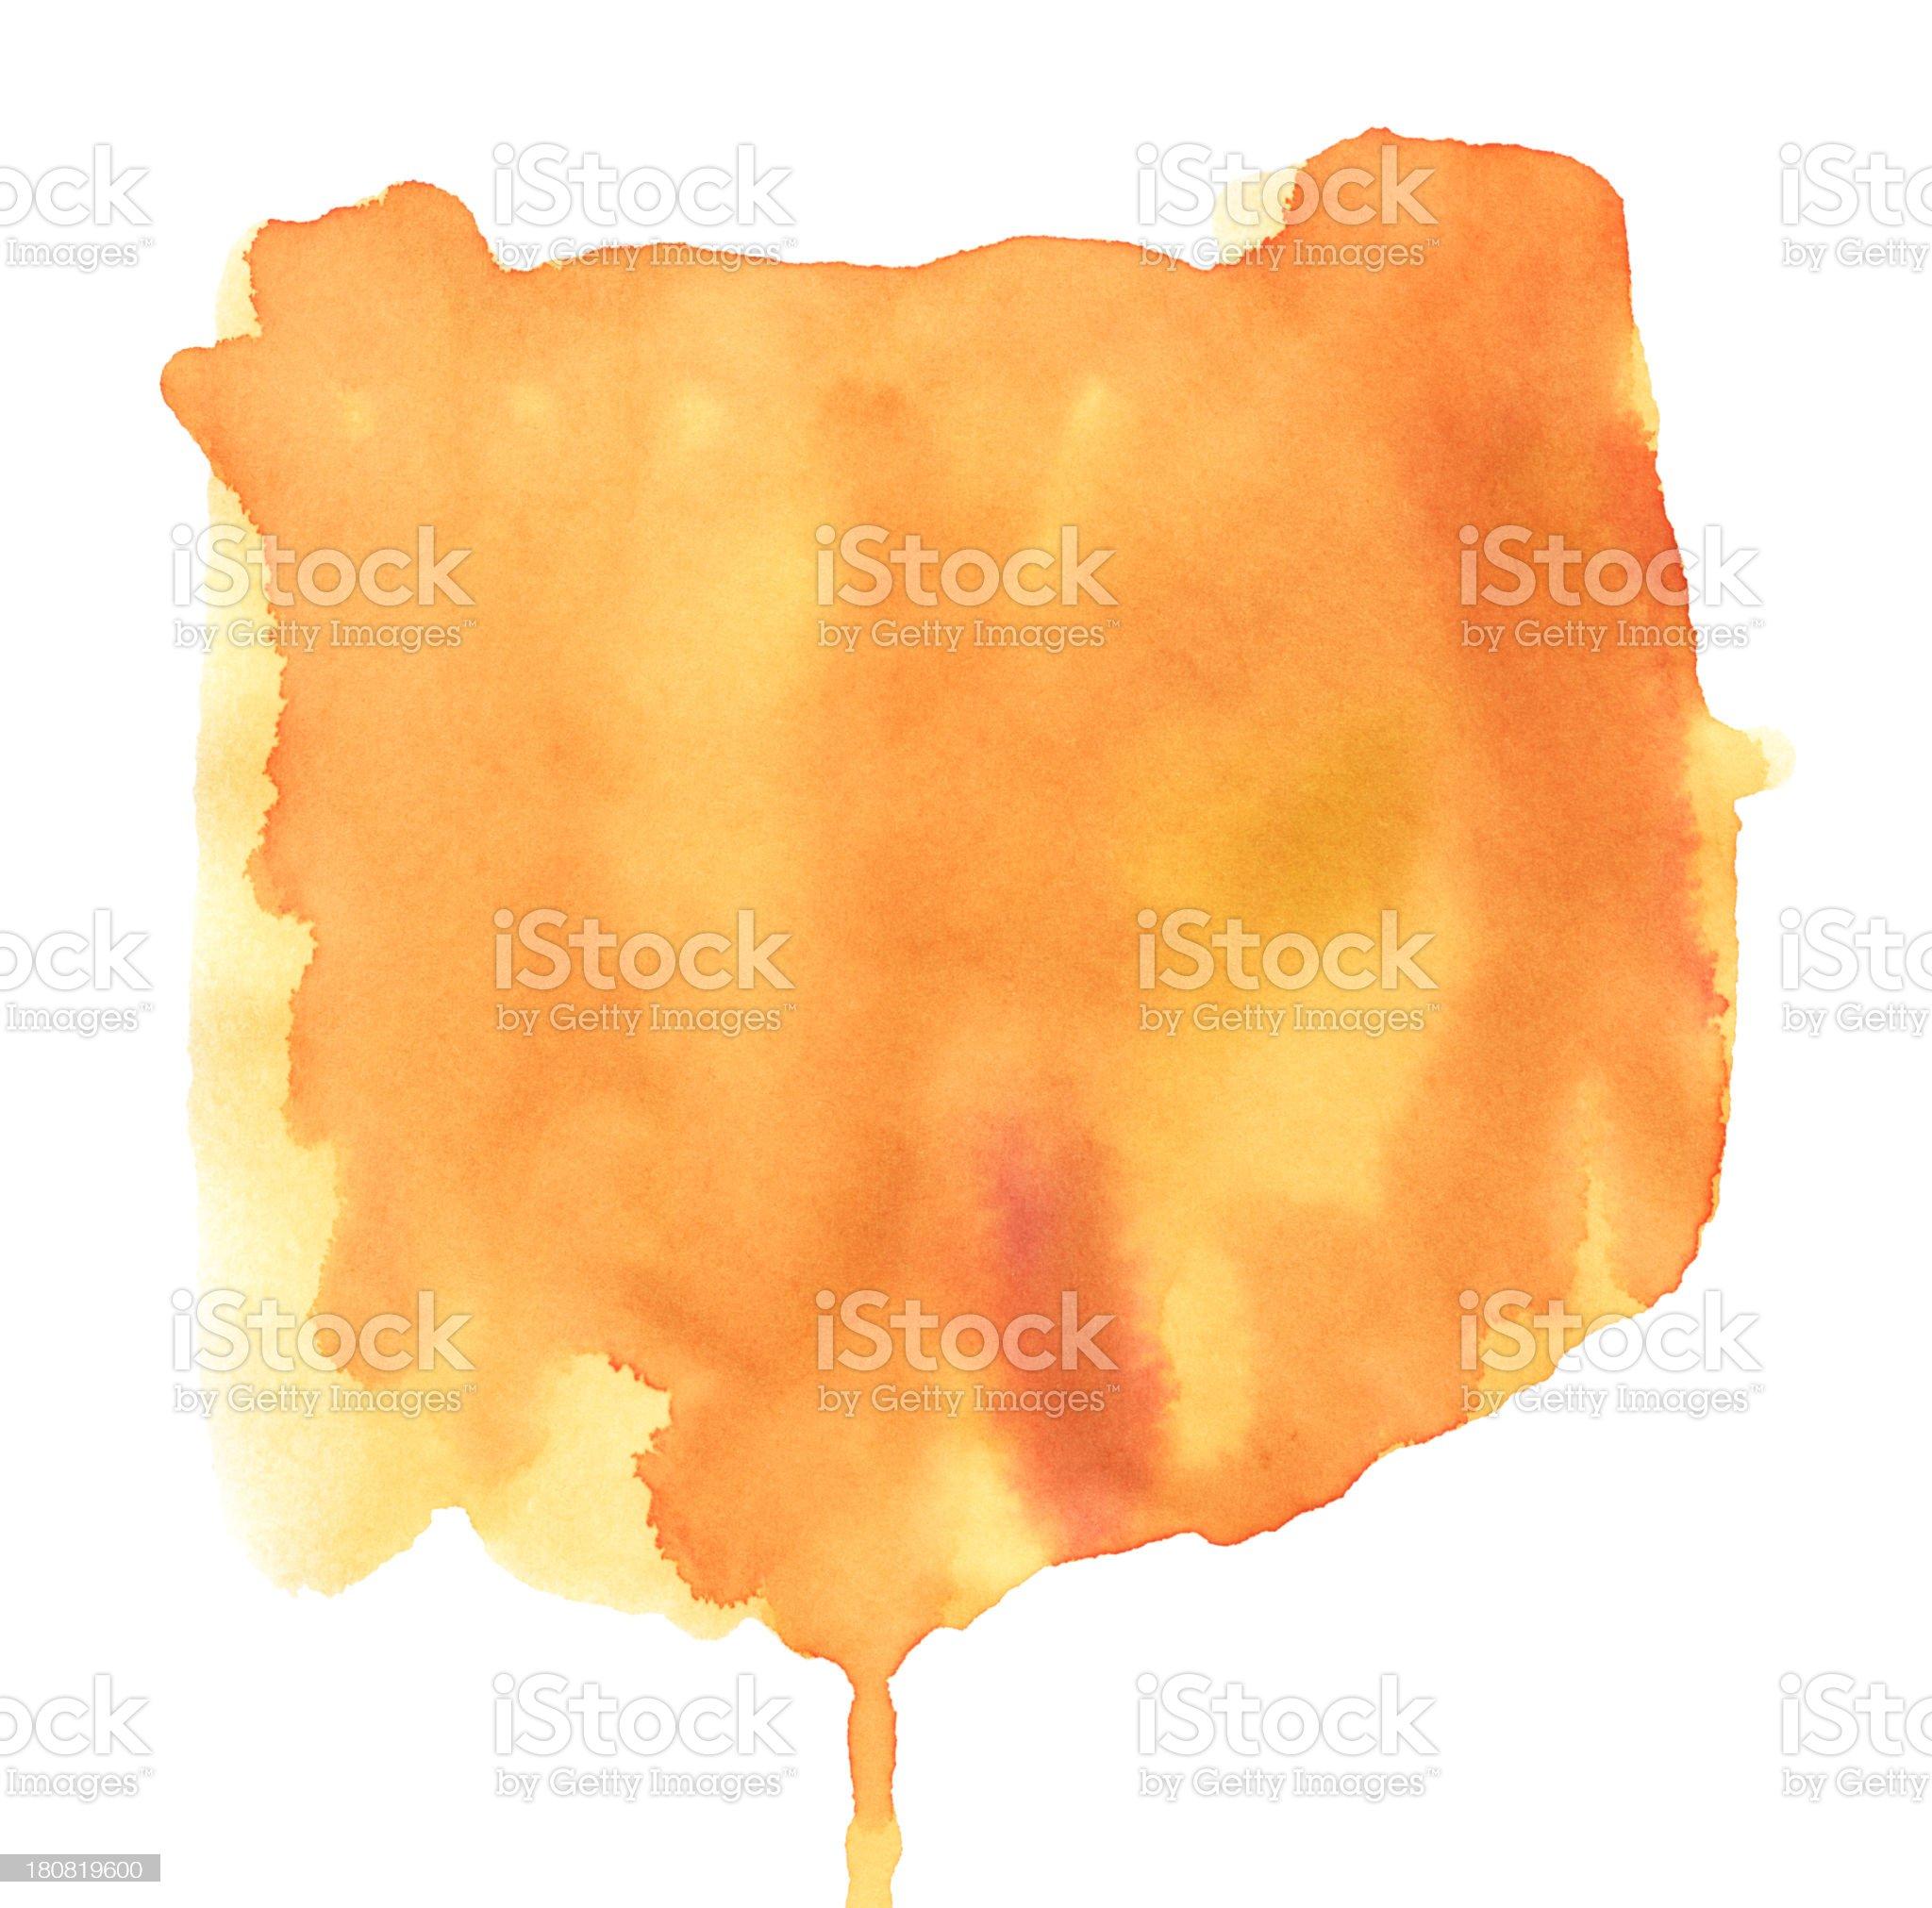 Orange Watercolor Paint Stock Texture royalty-free stock vector art